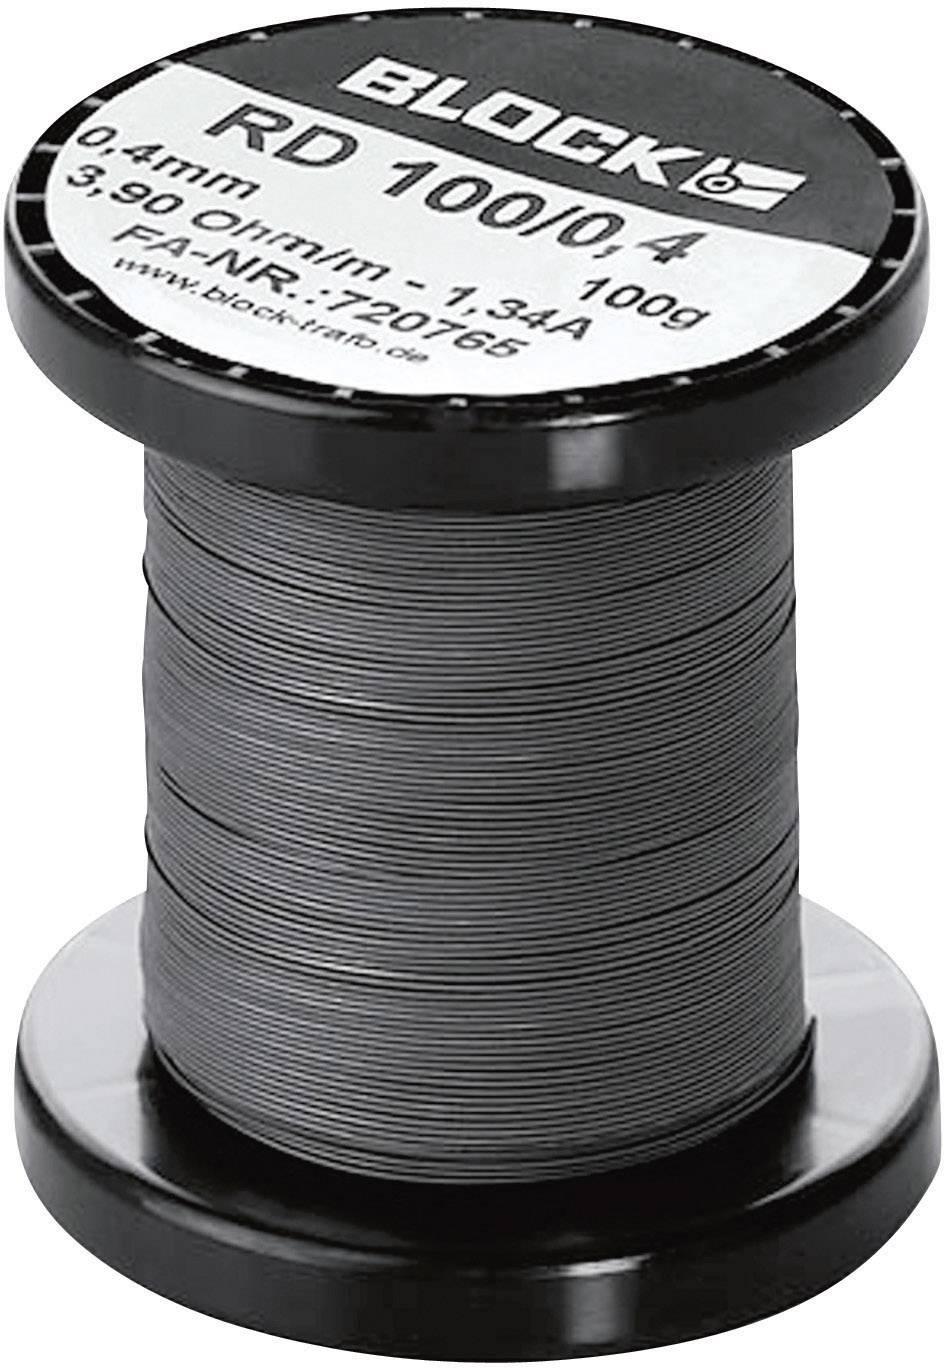 Odporový drát (konstantan) 0.433 Ω/m Block RD 100/1,2 9.9 m